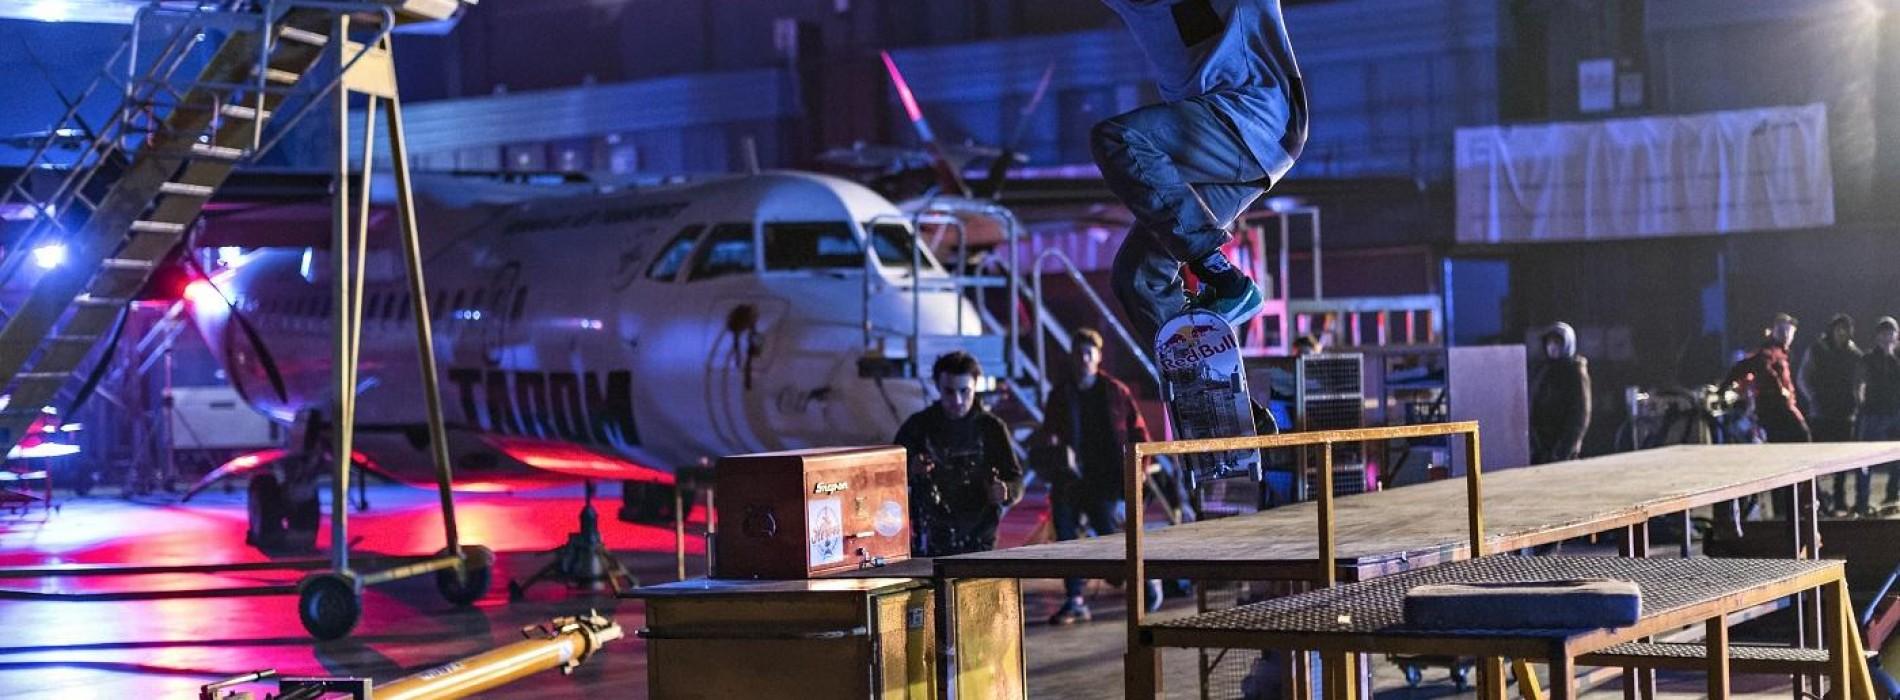 Avioanele românești prind aripi, într-o campanie cu skateri